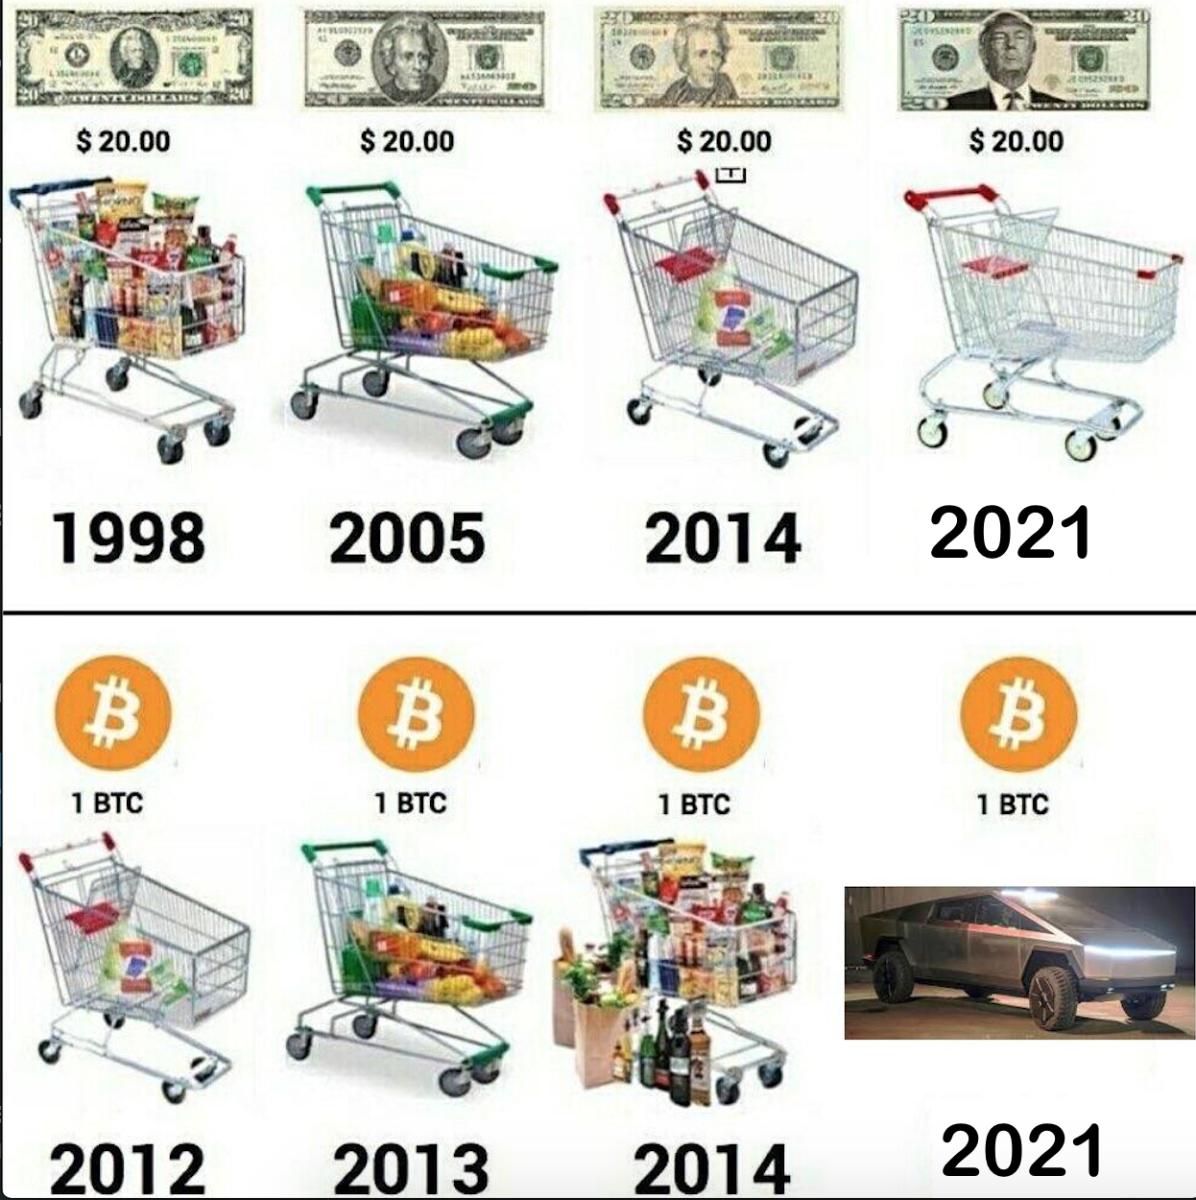 U.S. dollar inflation visualized at the top versus bitcoin's deflation at the bottom (Source: Lark Davis @TheCryptoLark).